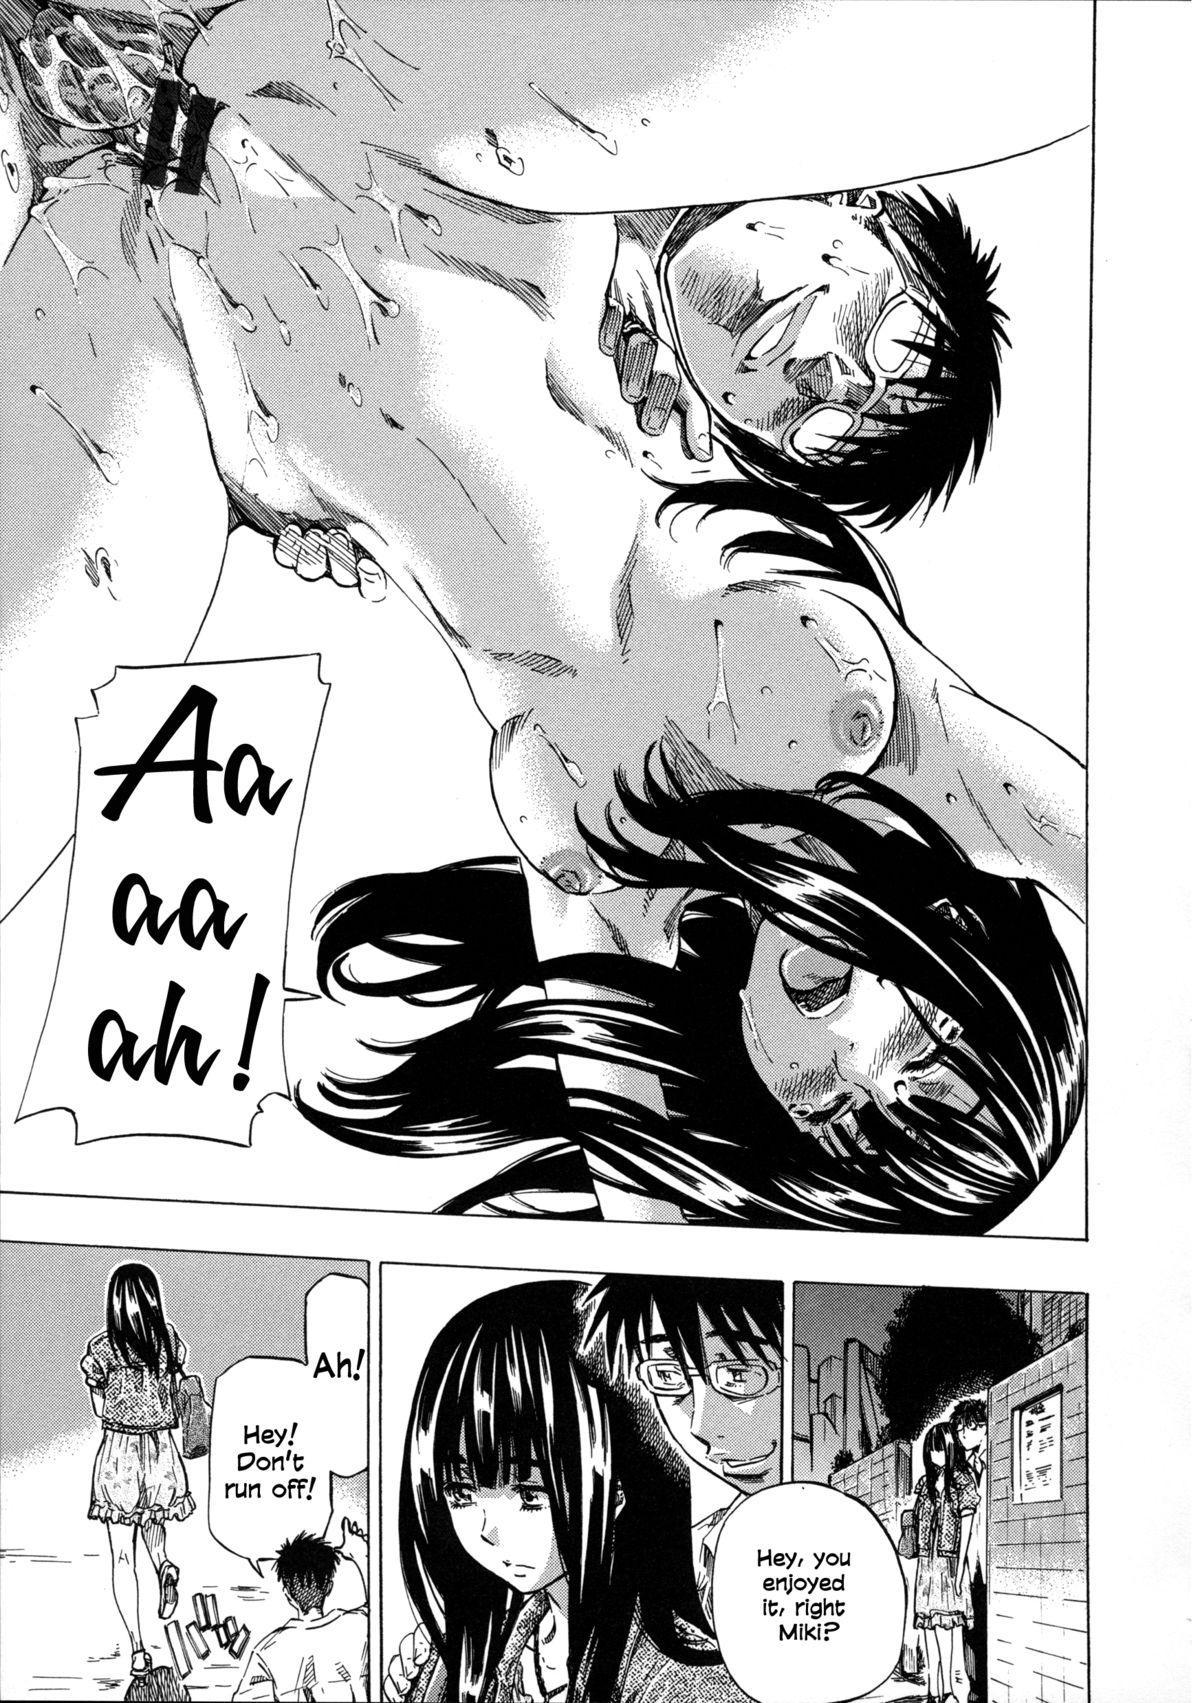 Kashiwazaki Miki wa Ironna Basho de Zenra Sanpo Shitemita   Miki Kashiwazaki Goes Naked in All Sorts of Places Ch. 1-4 87